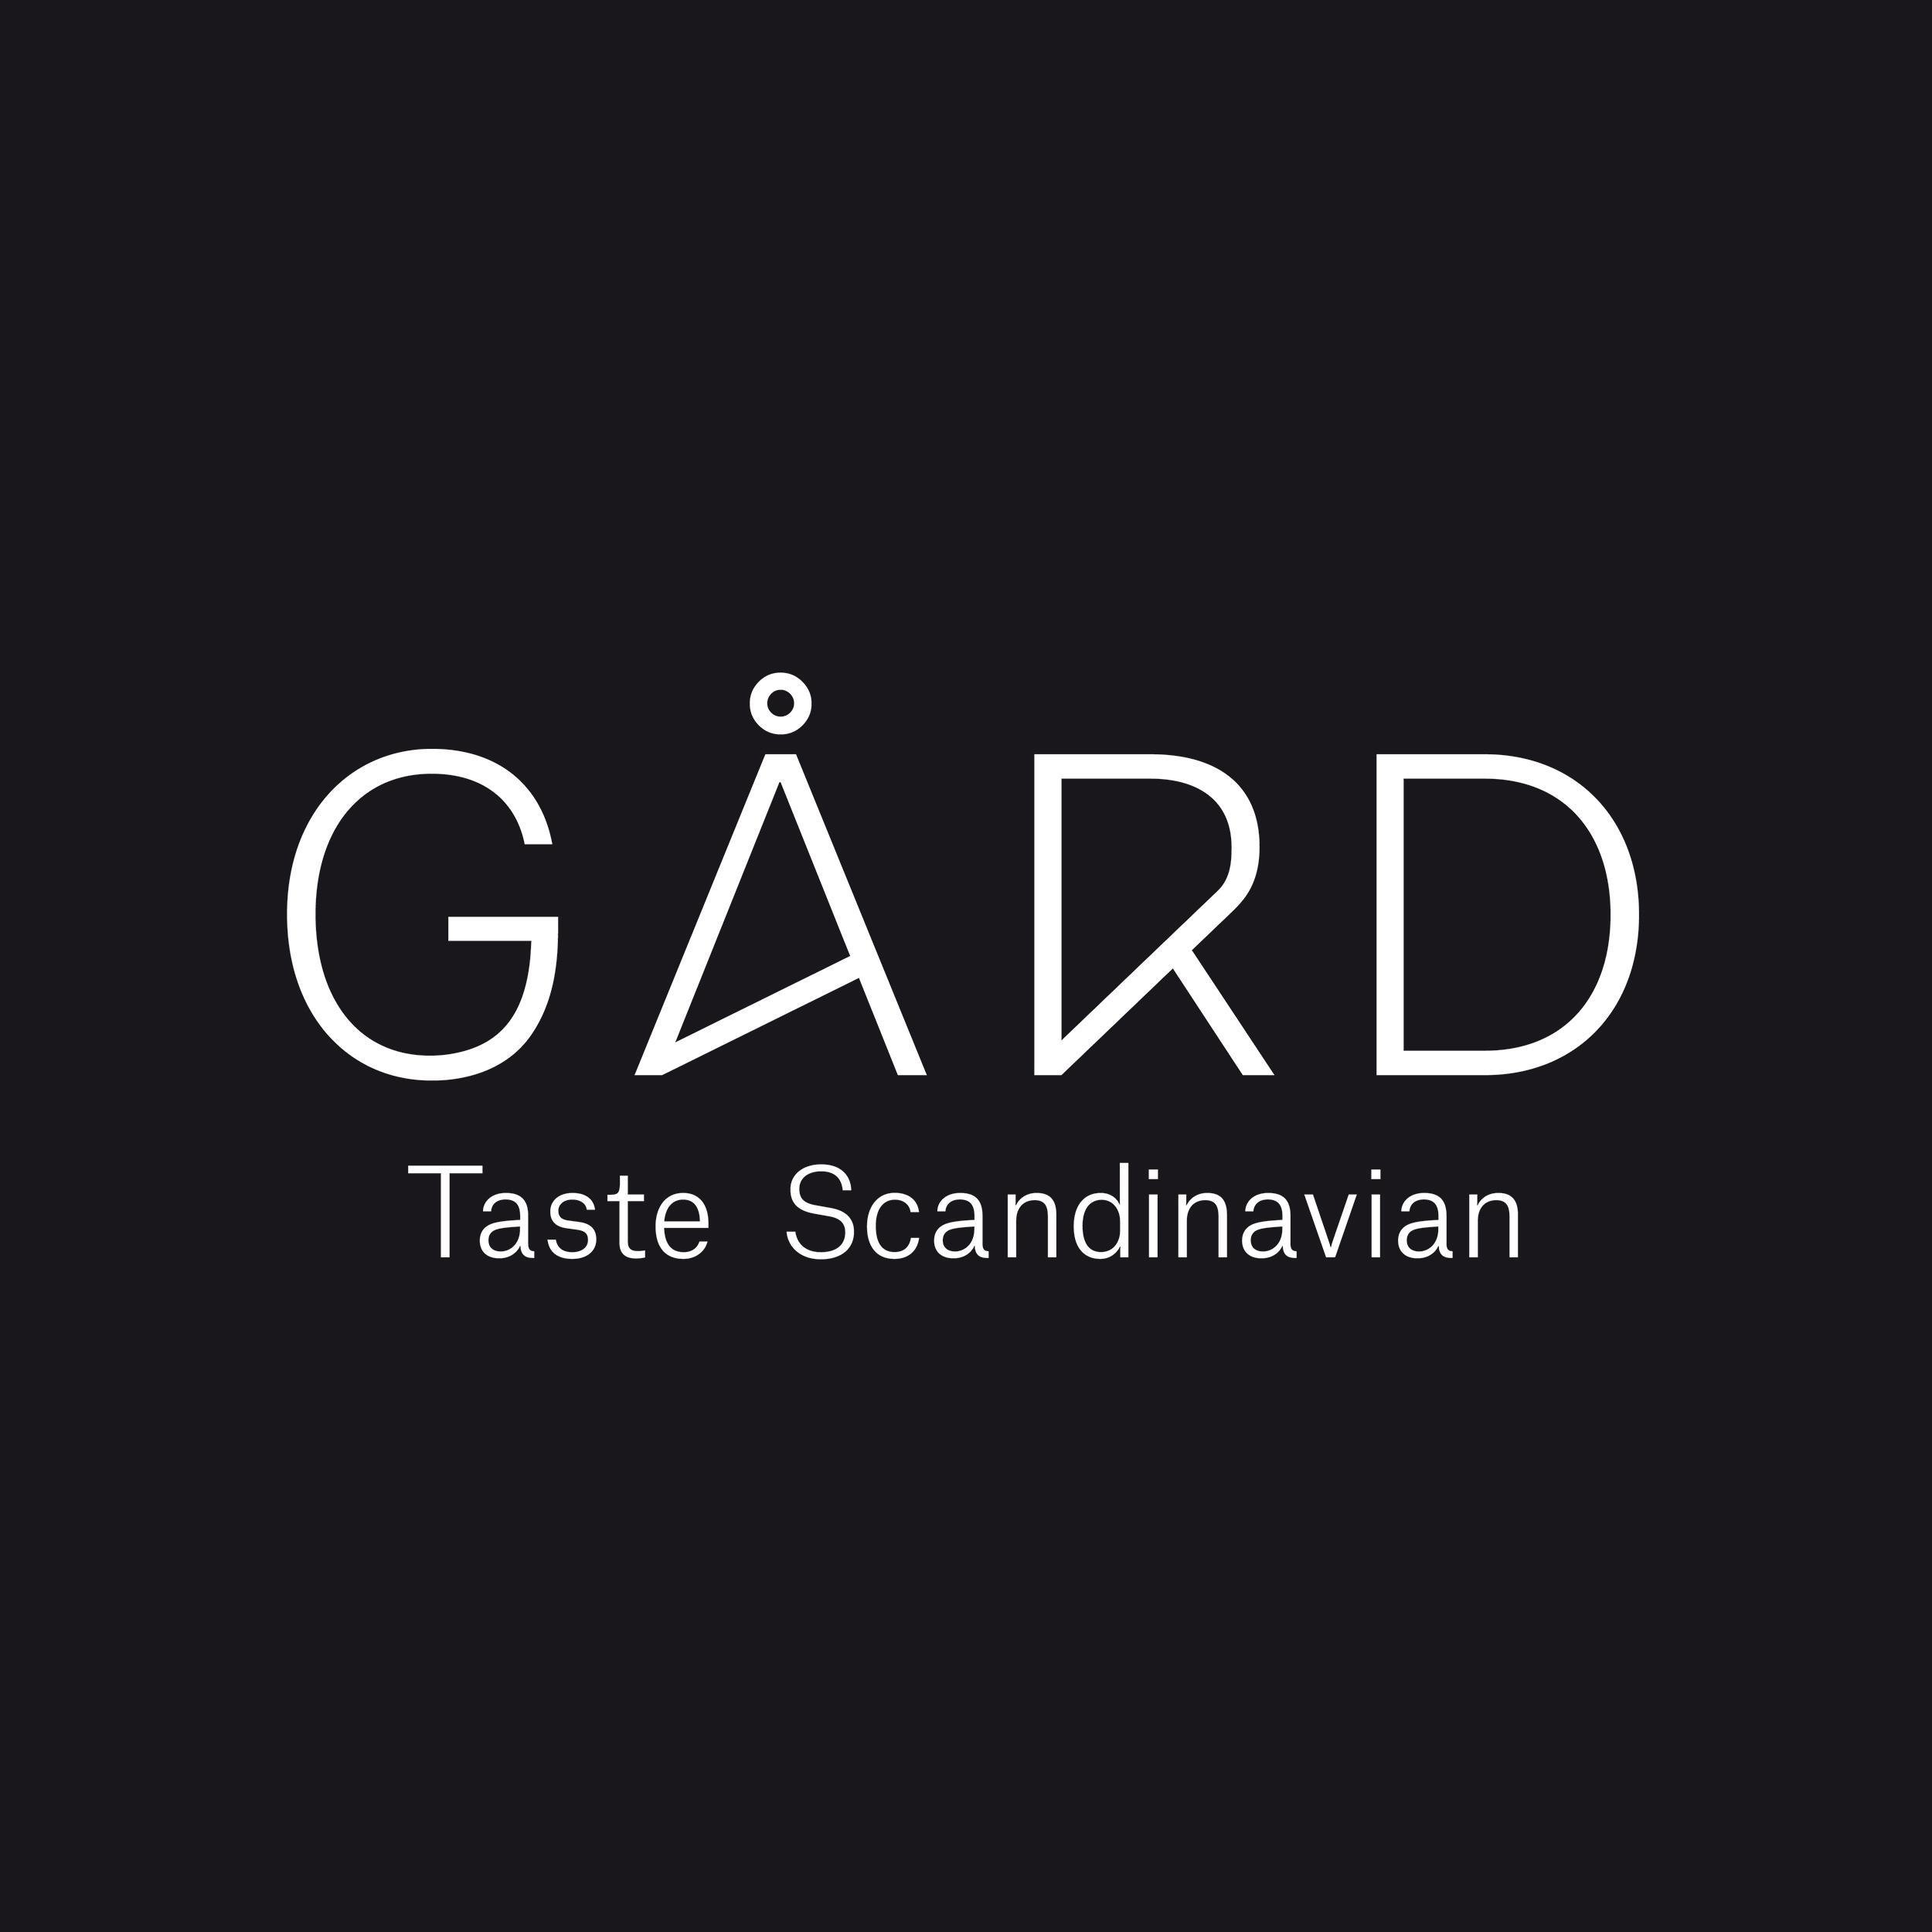 GÅRD Taste Scandinavian Brussels